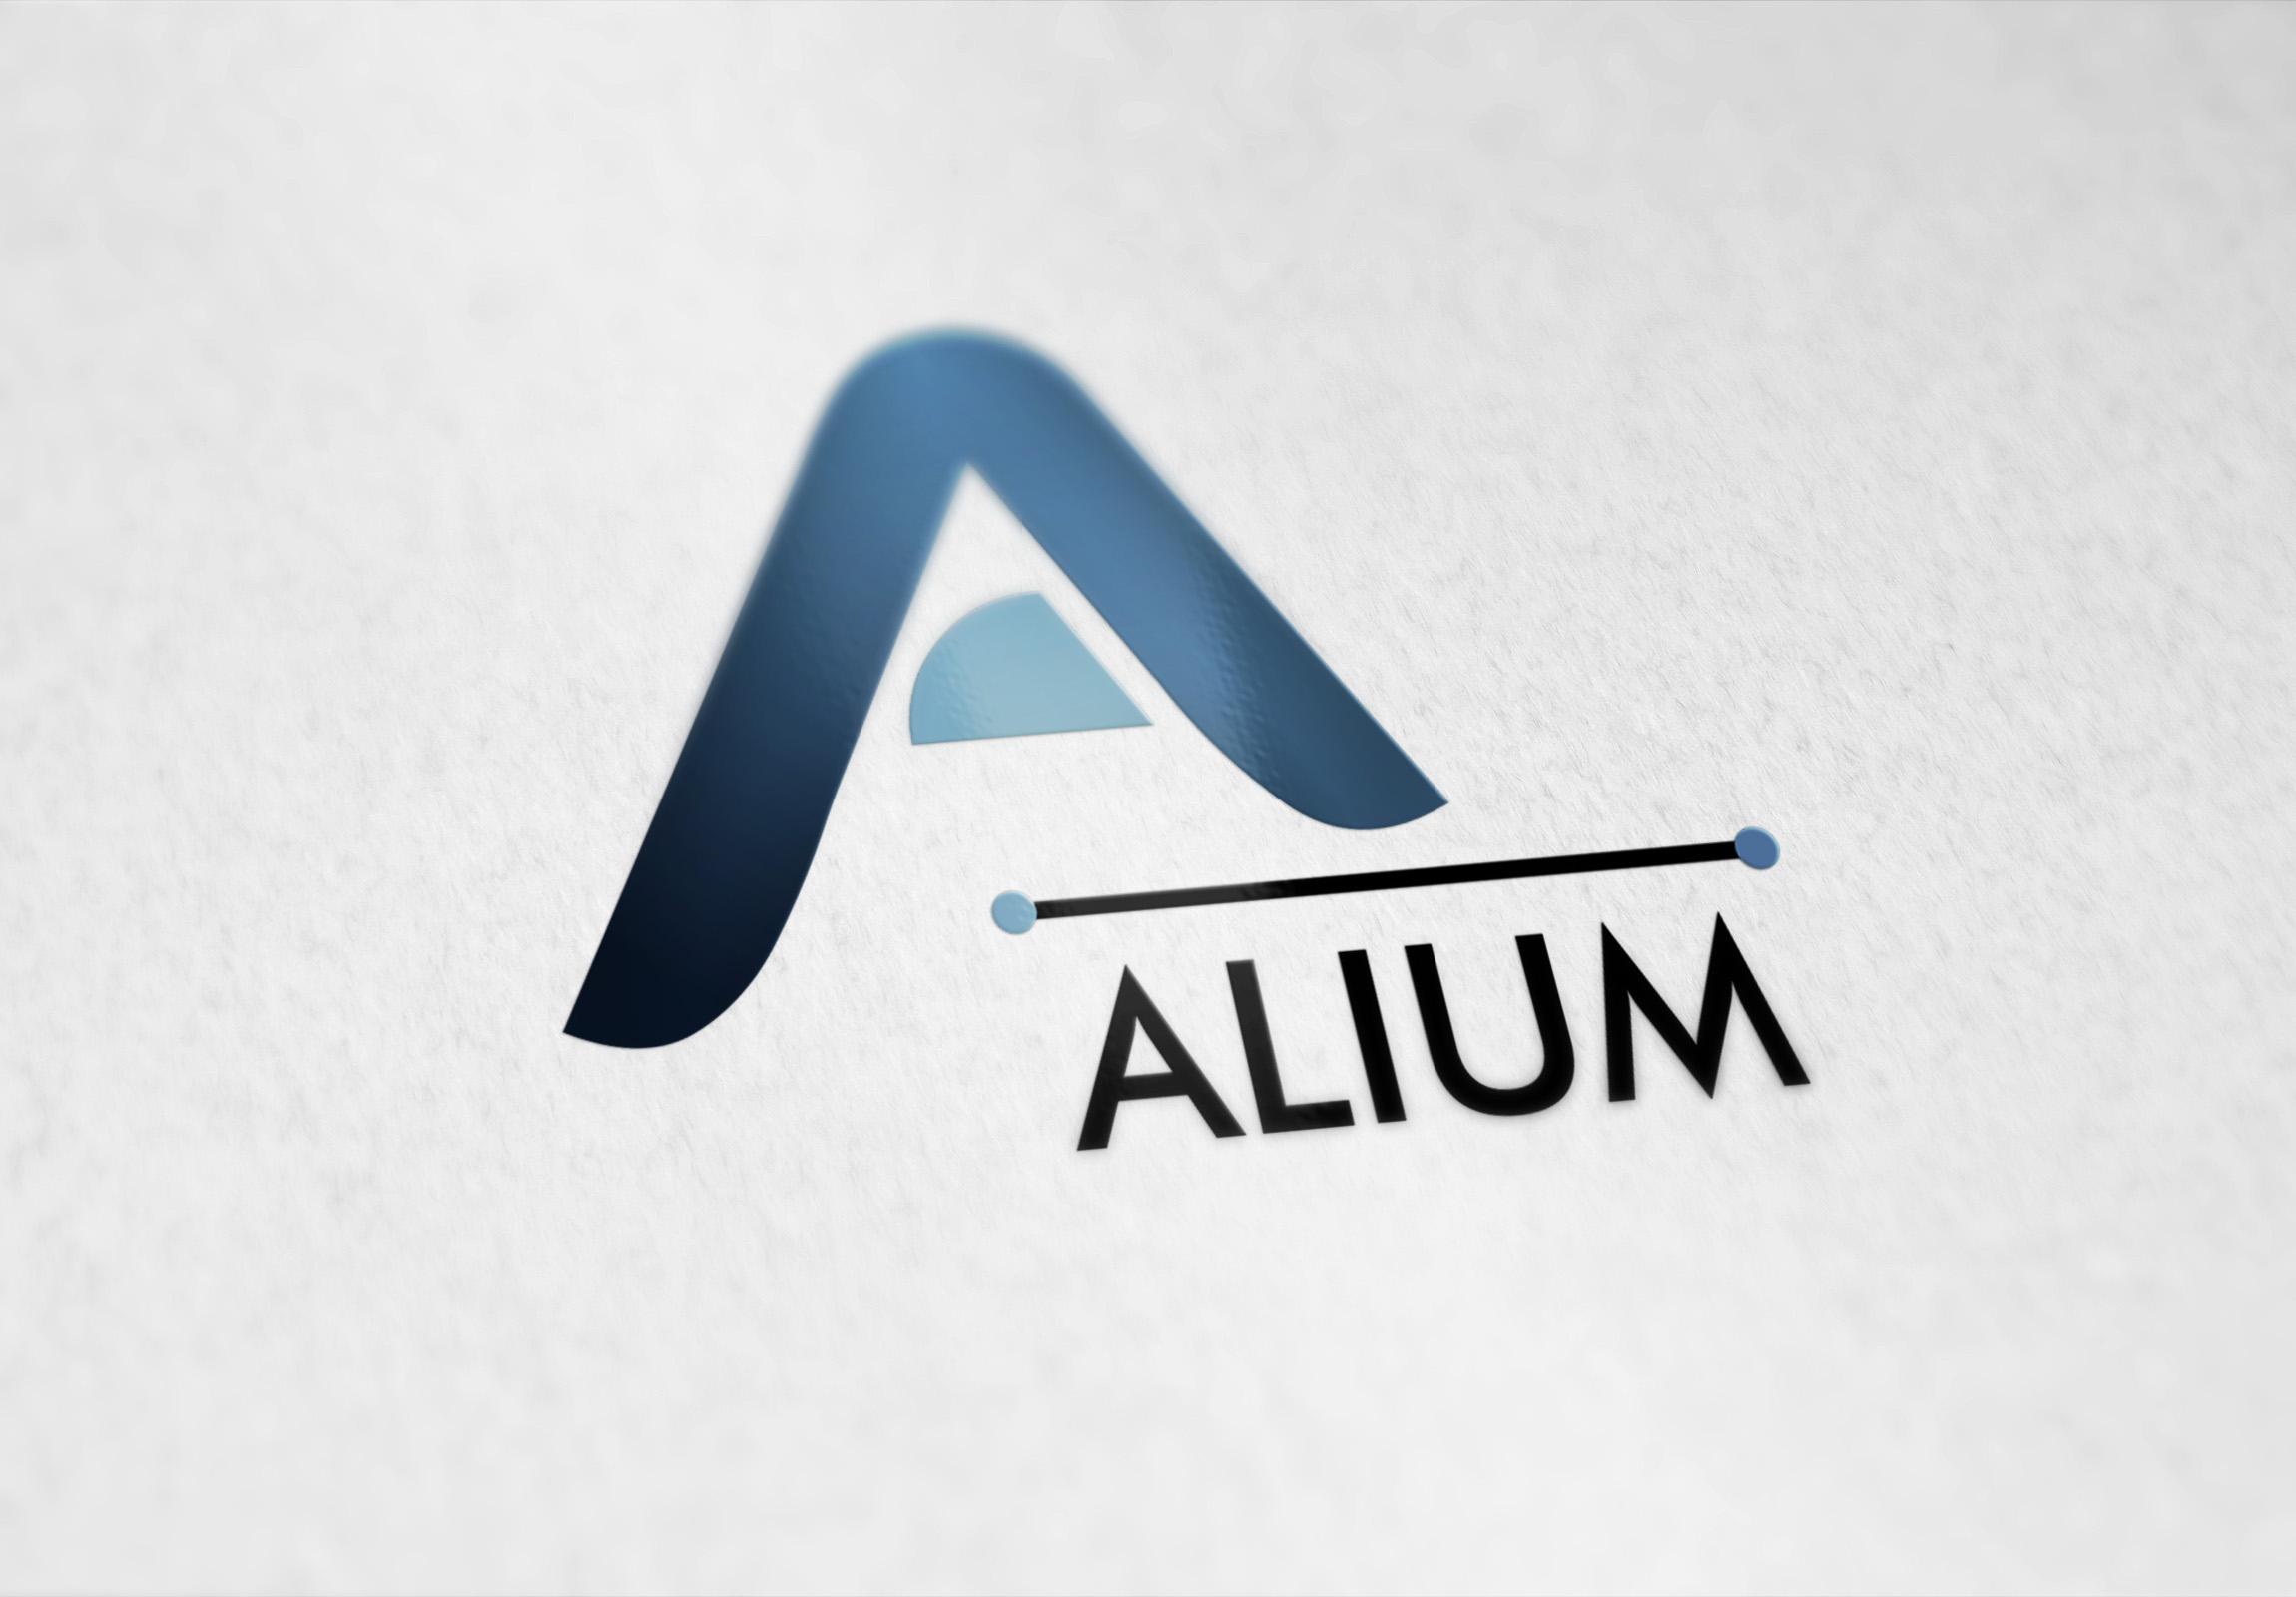 Логотип для дизайн студии фото f_47759ea4dcce55fb.jpg